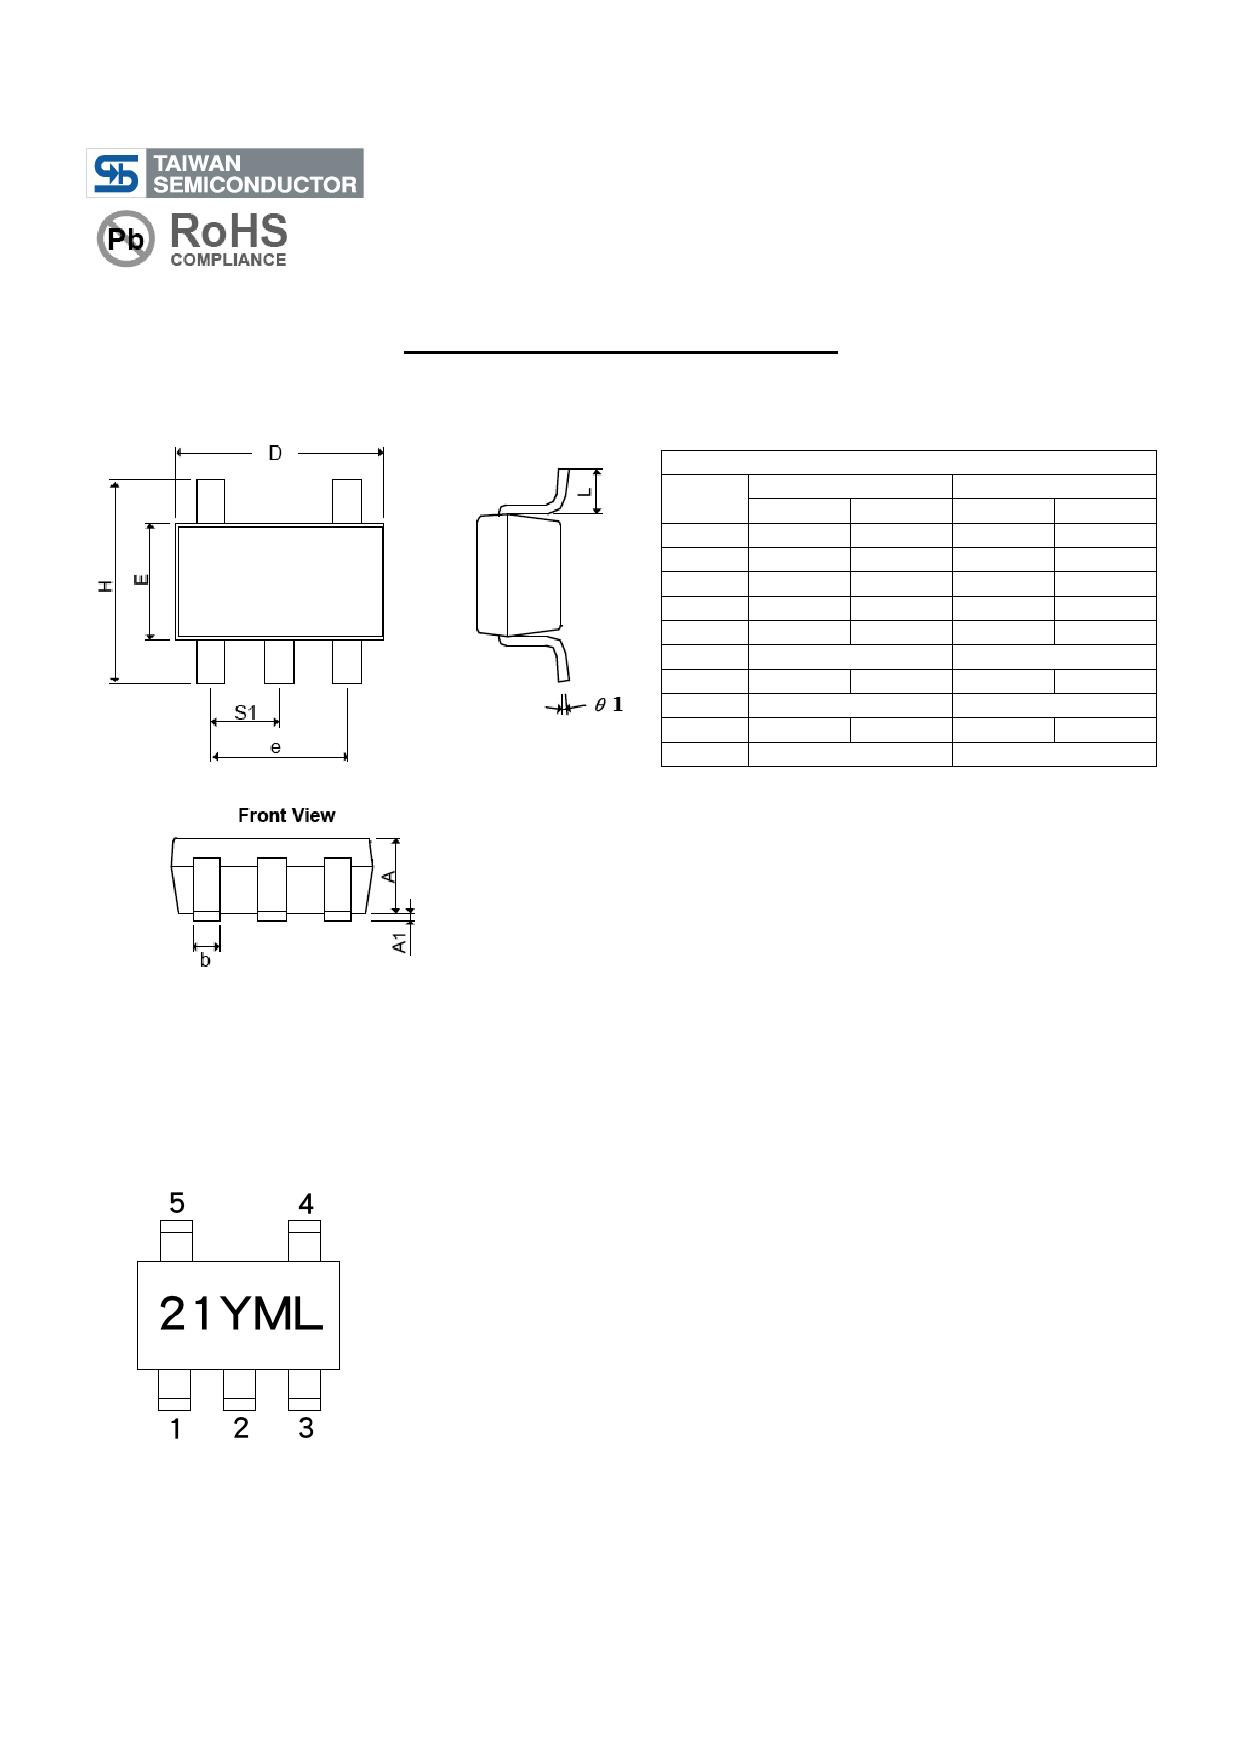 TS321 equivalent